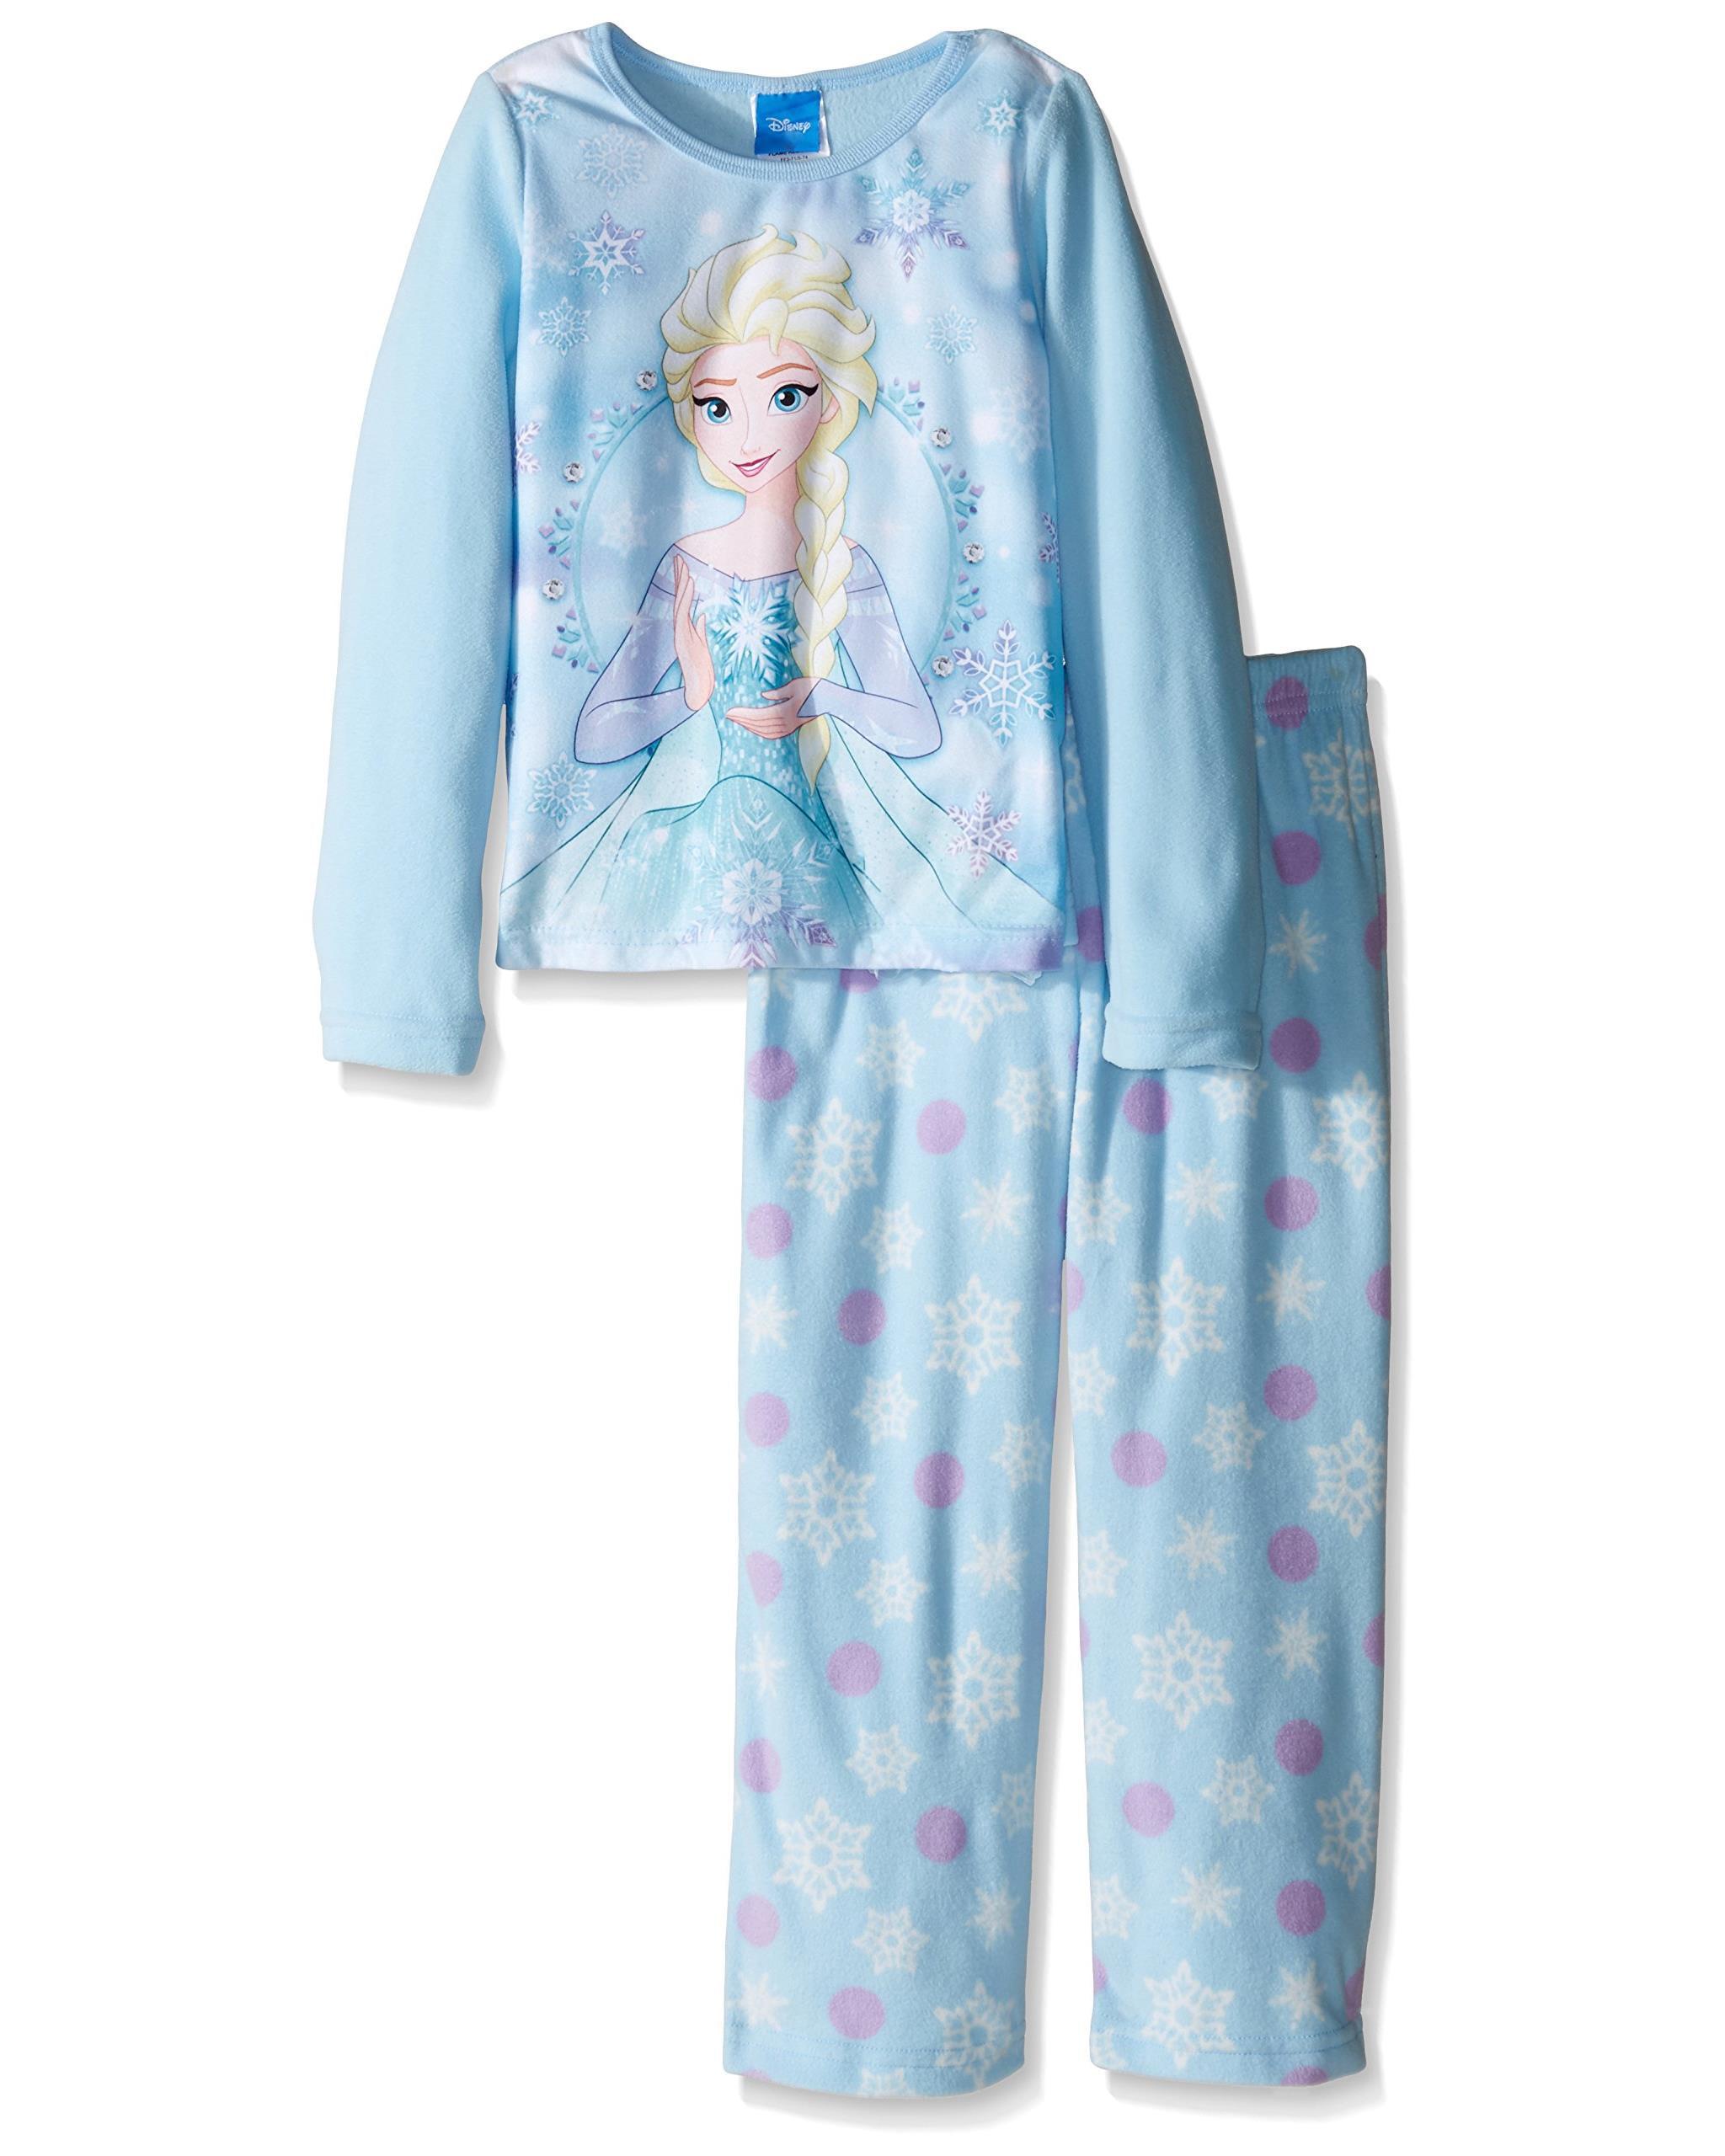 Disney Frozen Girls Elsa Two-Piece Pajamas